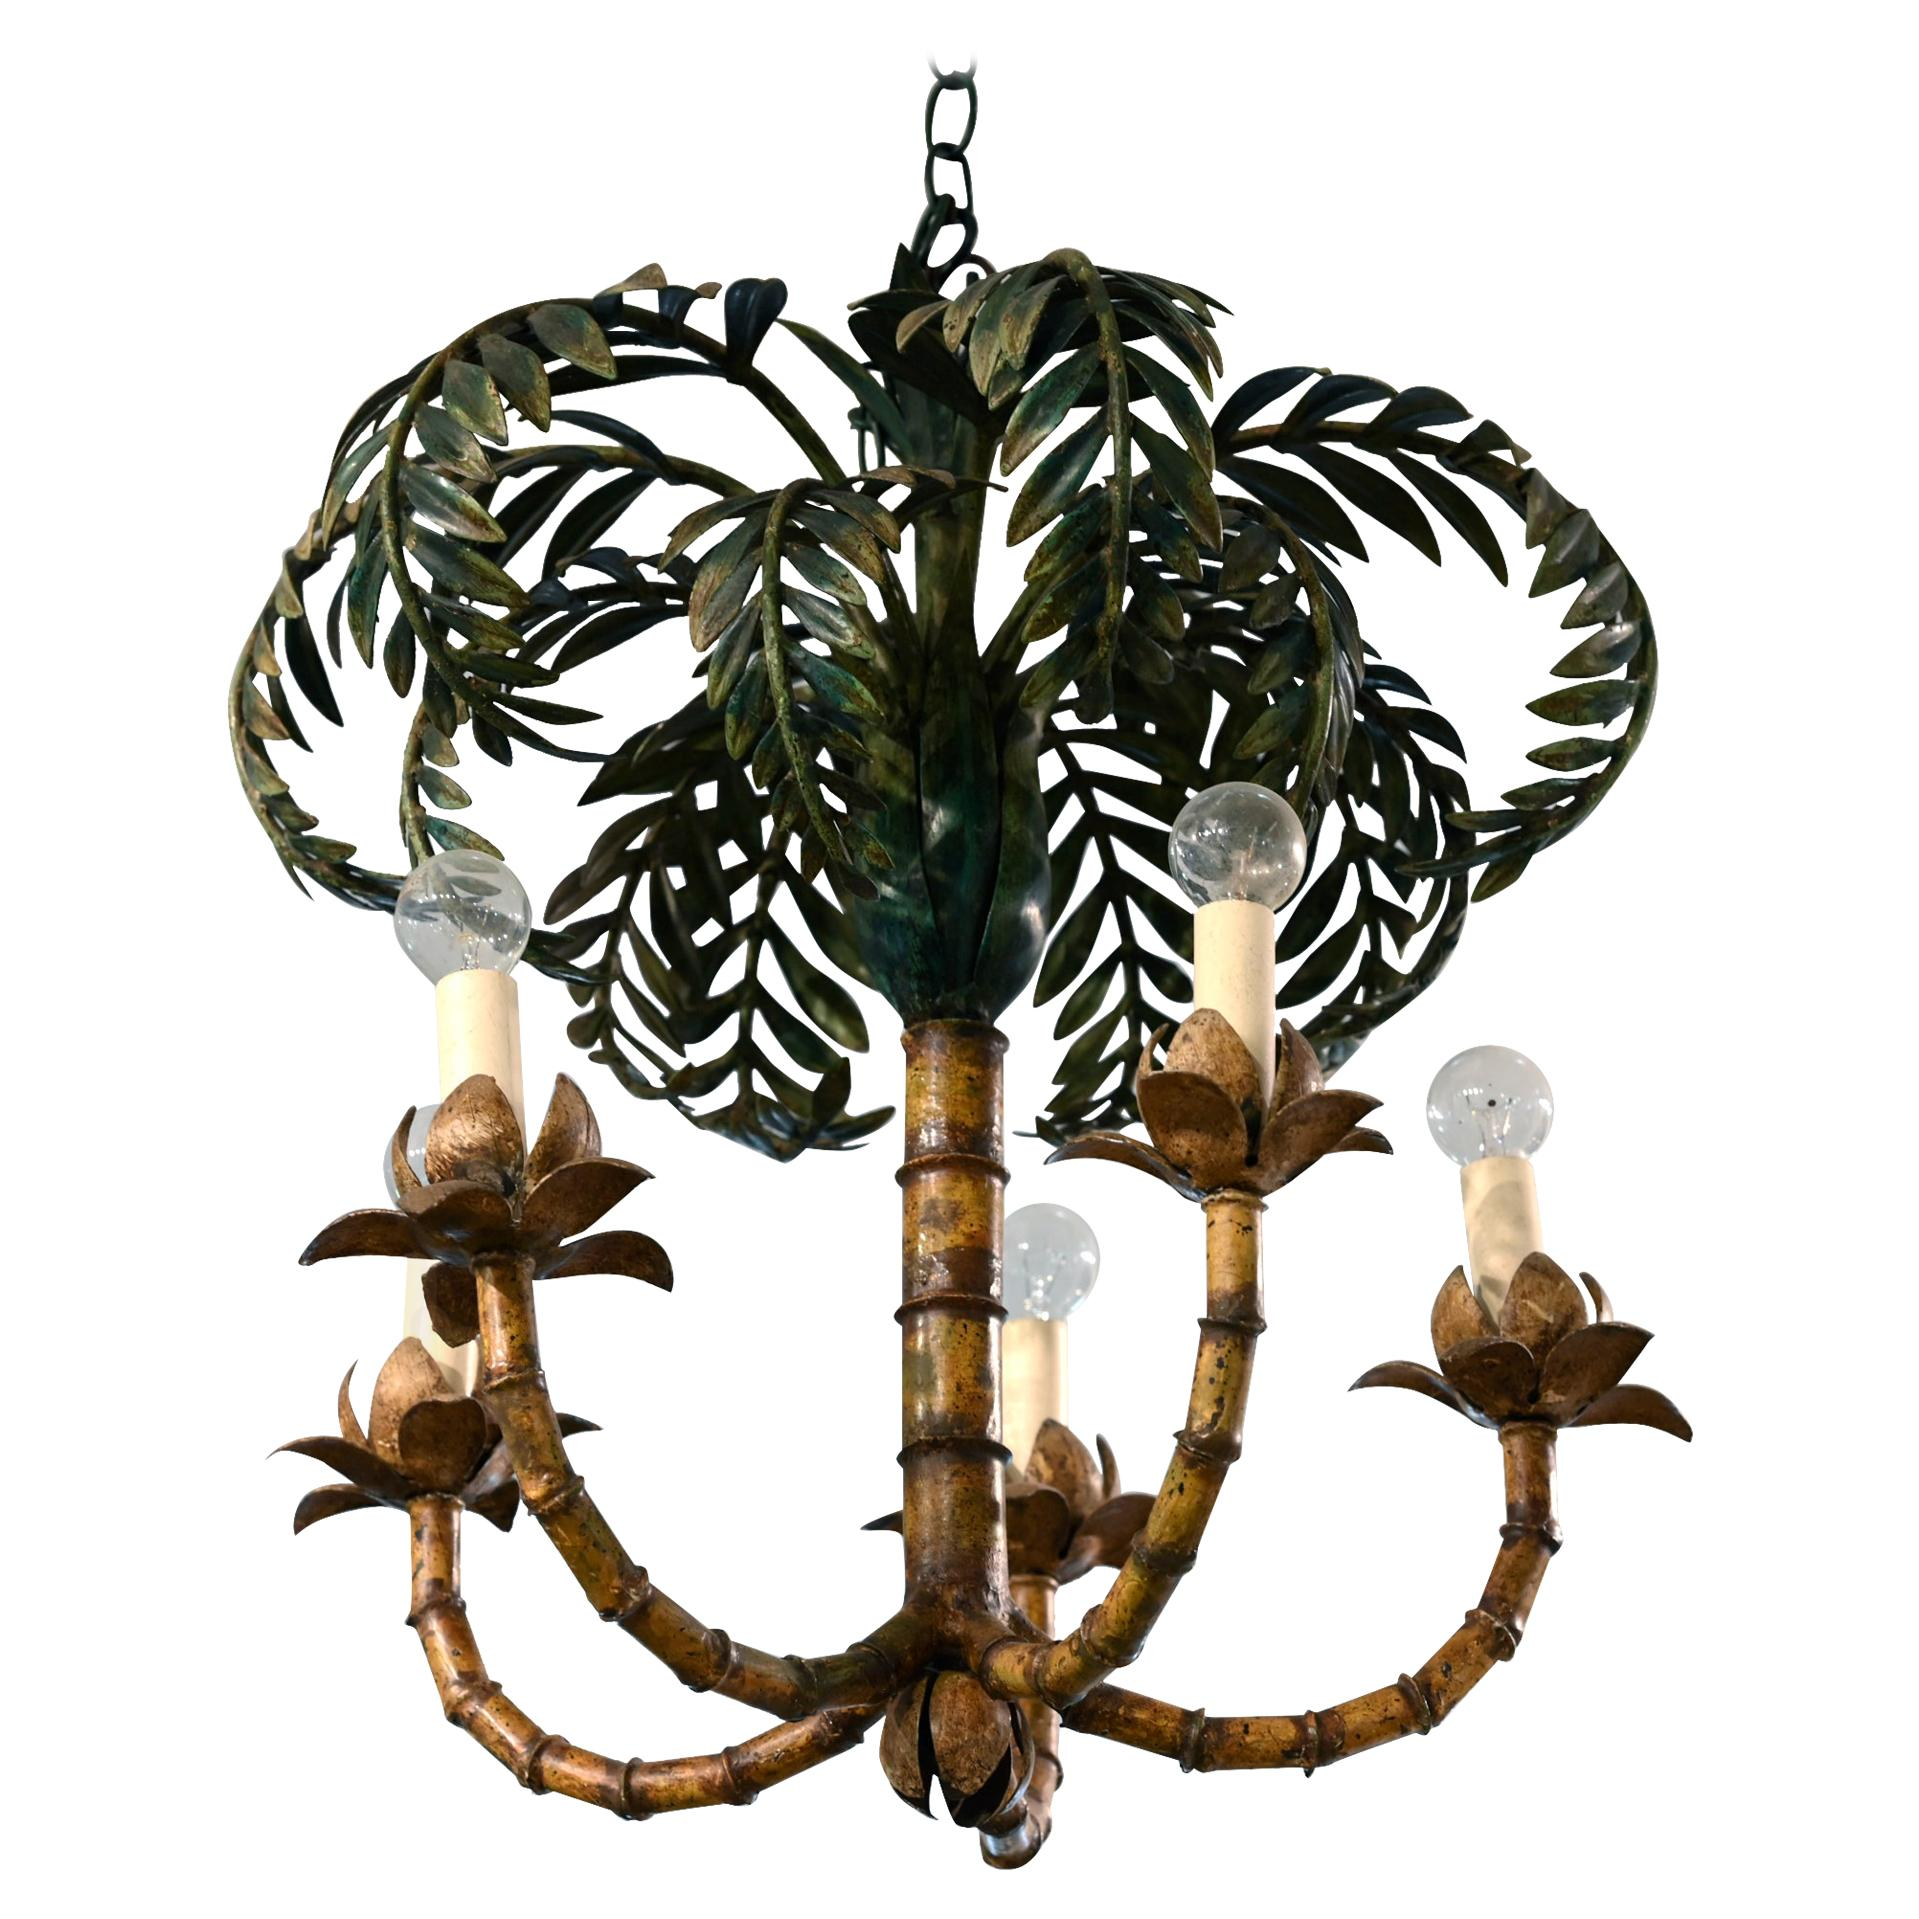 Palm Chandelier France circa 1900-1920, Electrified, Art Deco, Sheet Metal